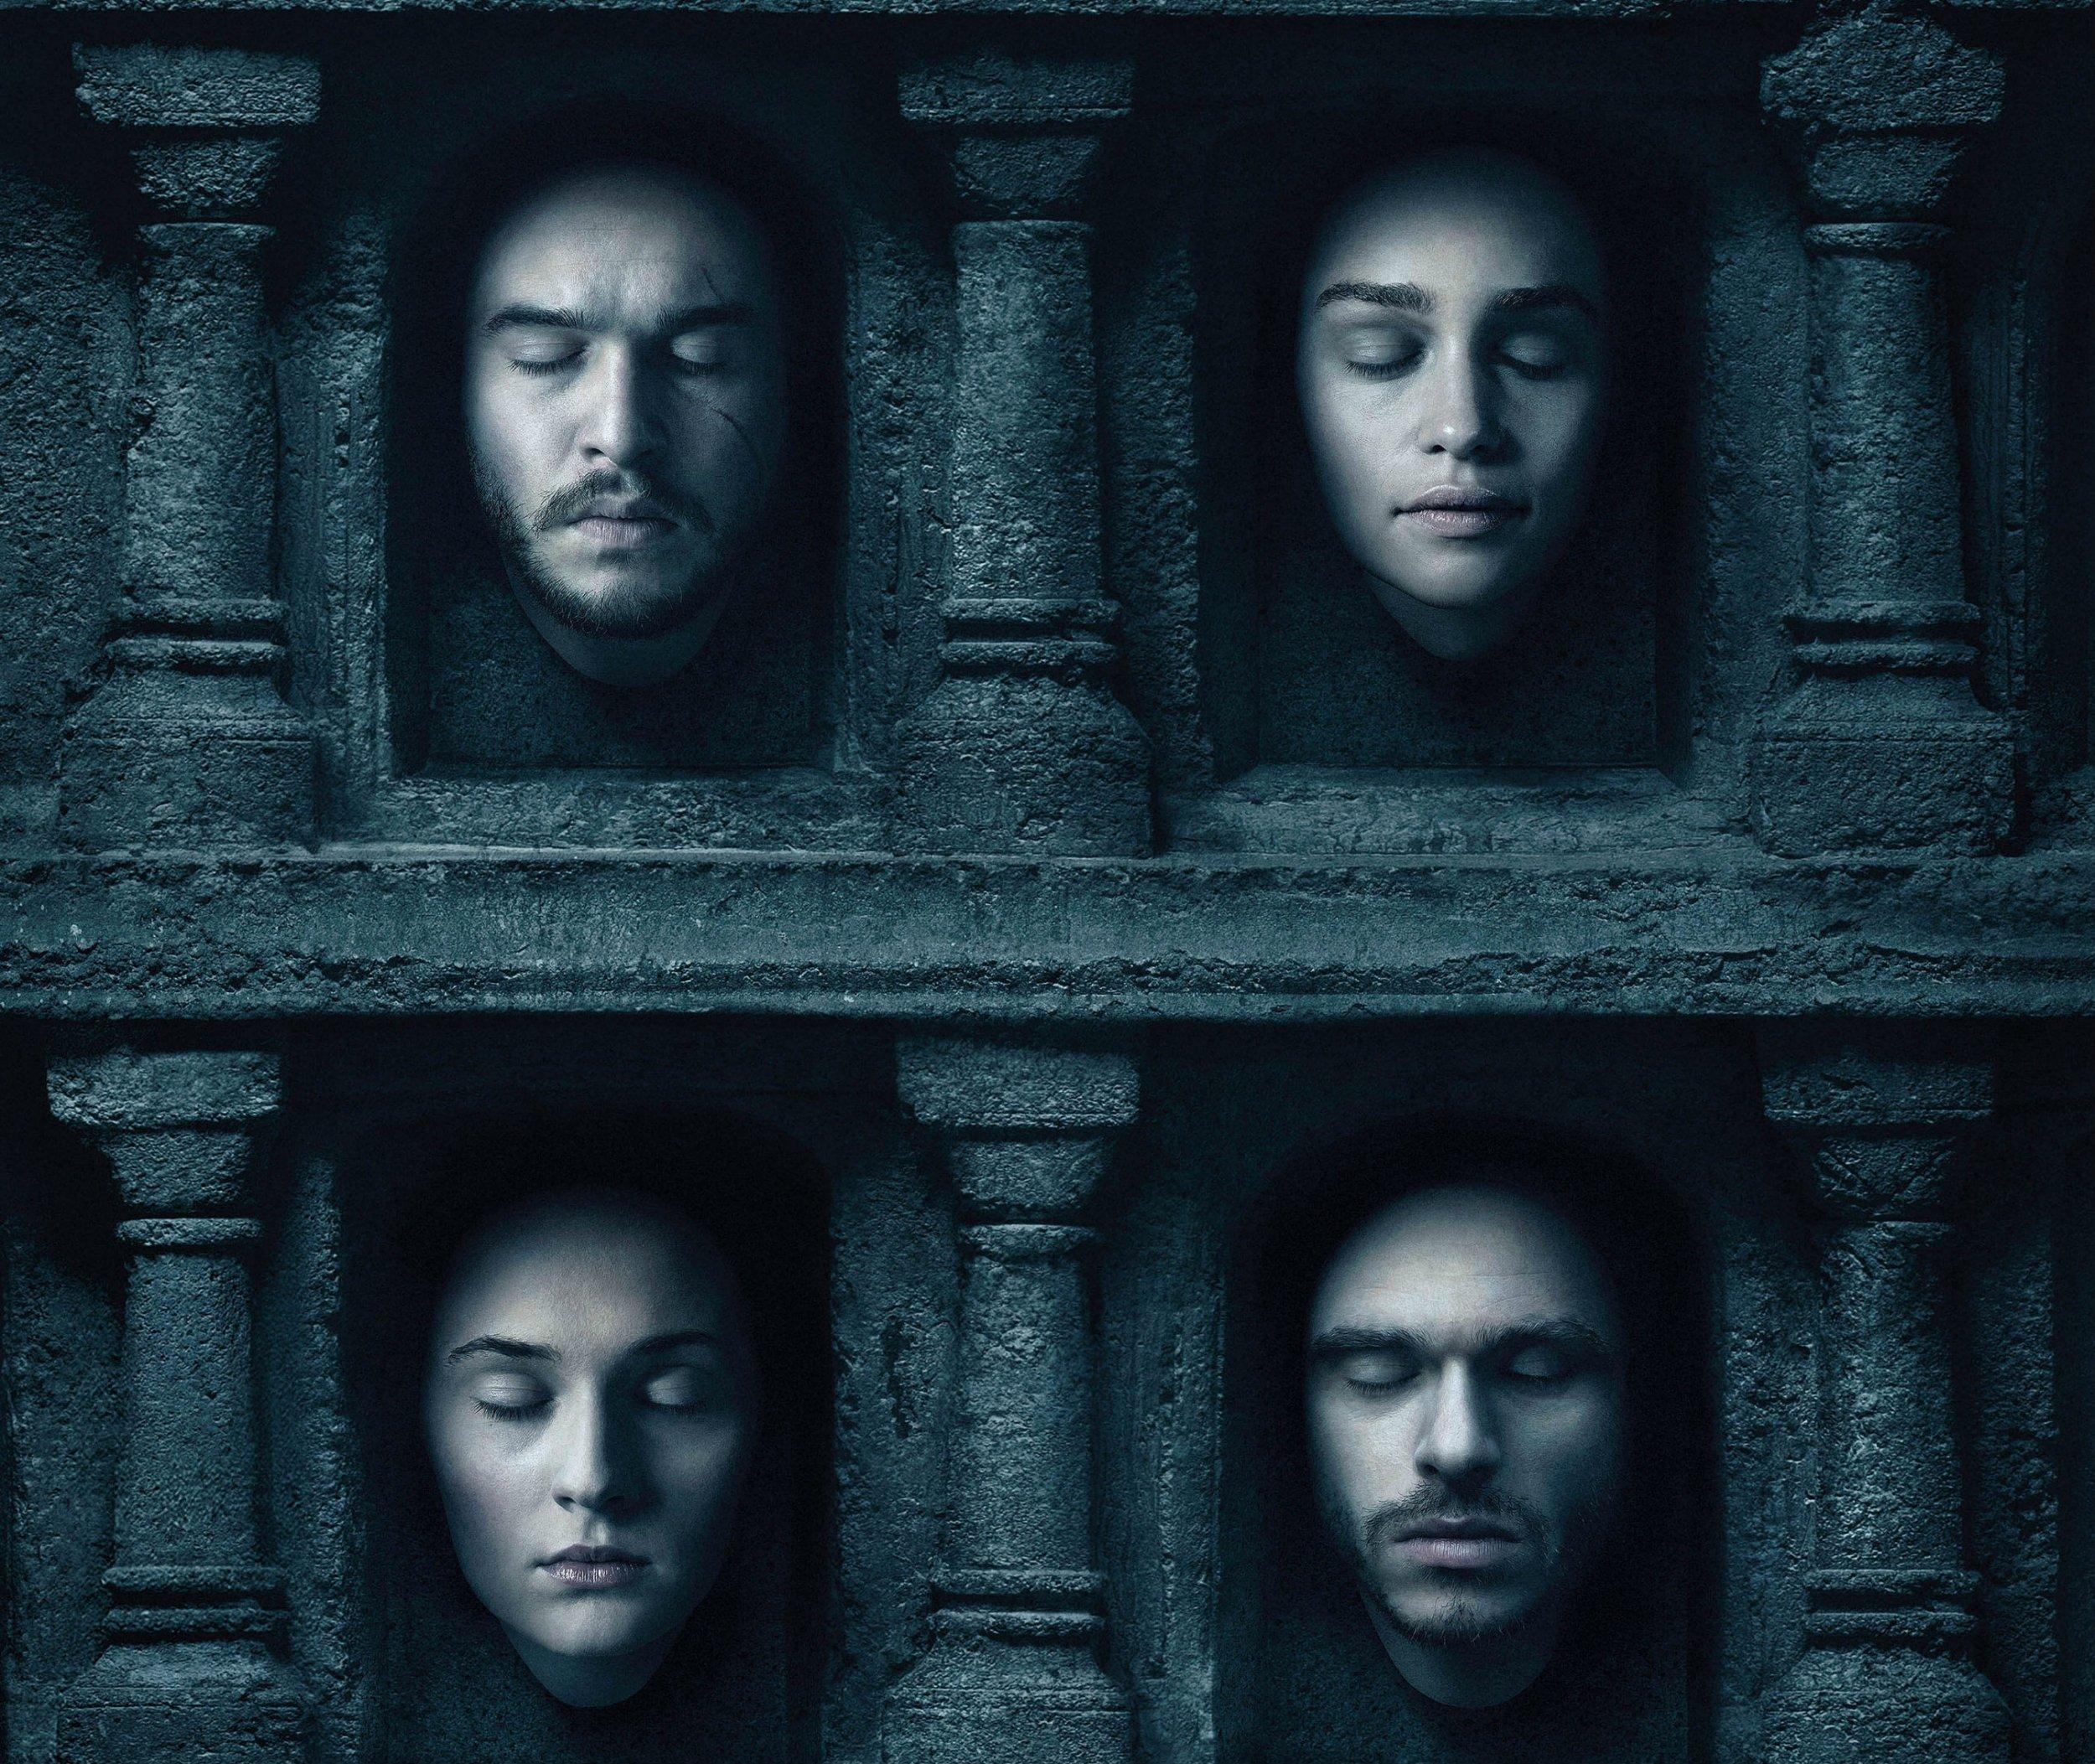 Game of Thrones Season 6 spoilers